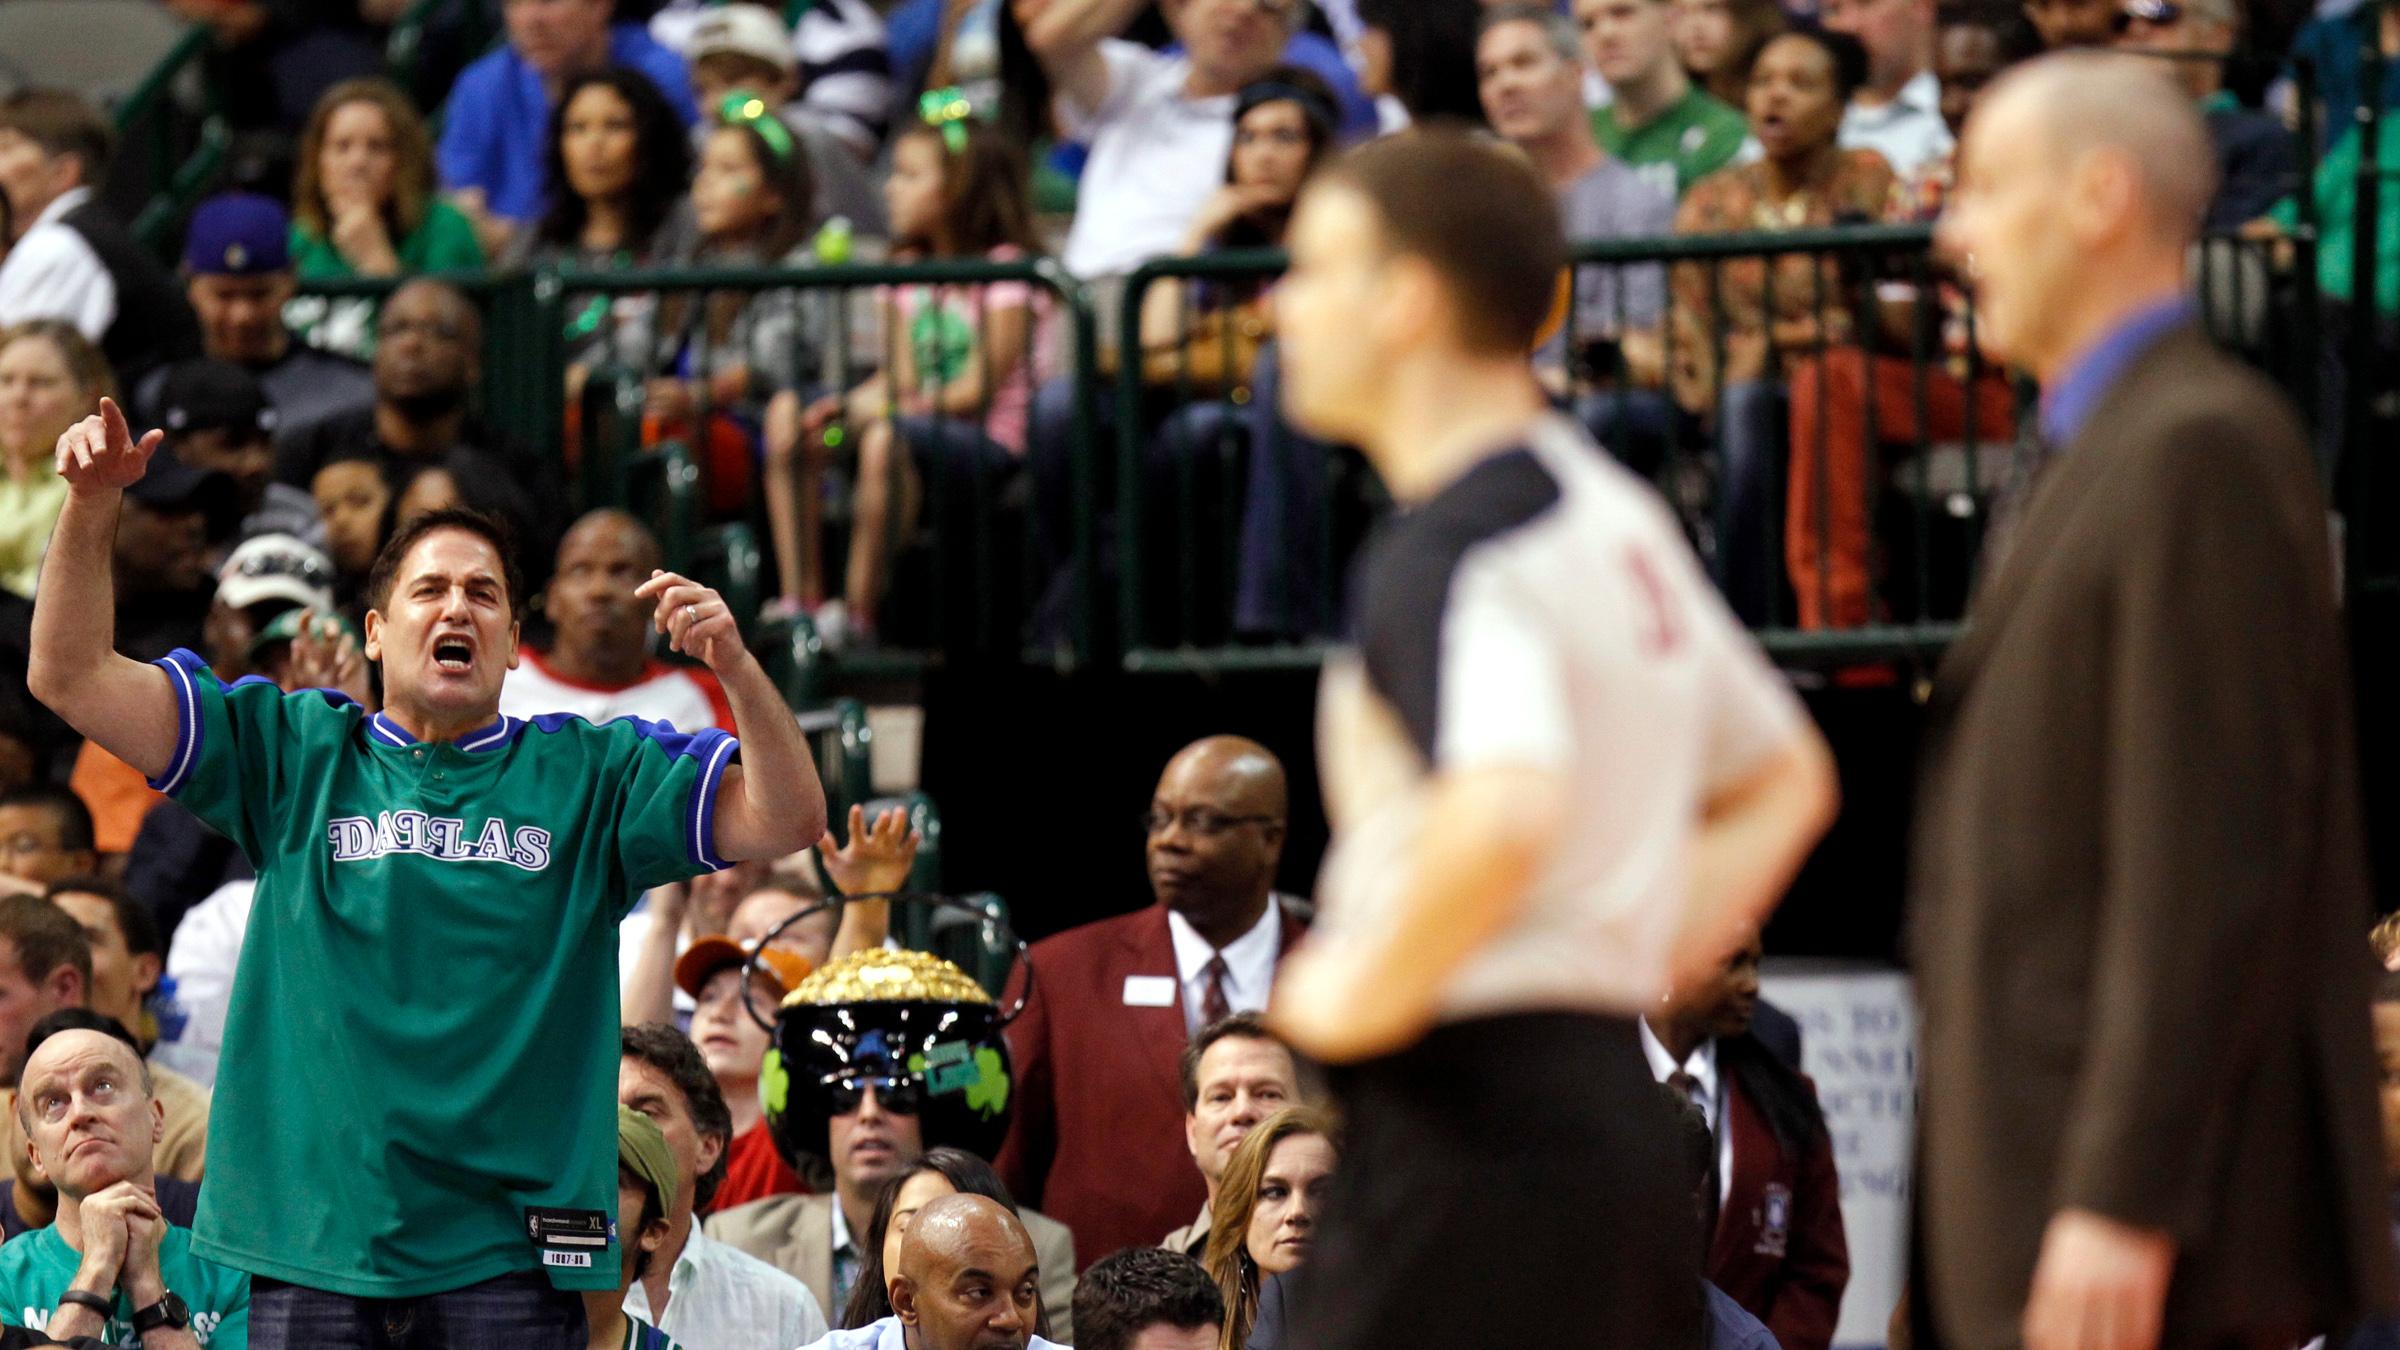 Dallas Mavericks owner Mark Cuban reacts as Oklahoma City Thunder head coach Rick Carlisle (R) watches during the second half of their NBA basketball in Dallas, Texas March 17, 2013.